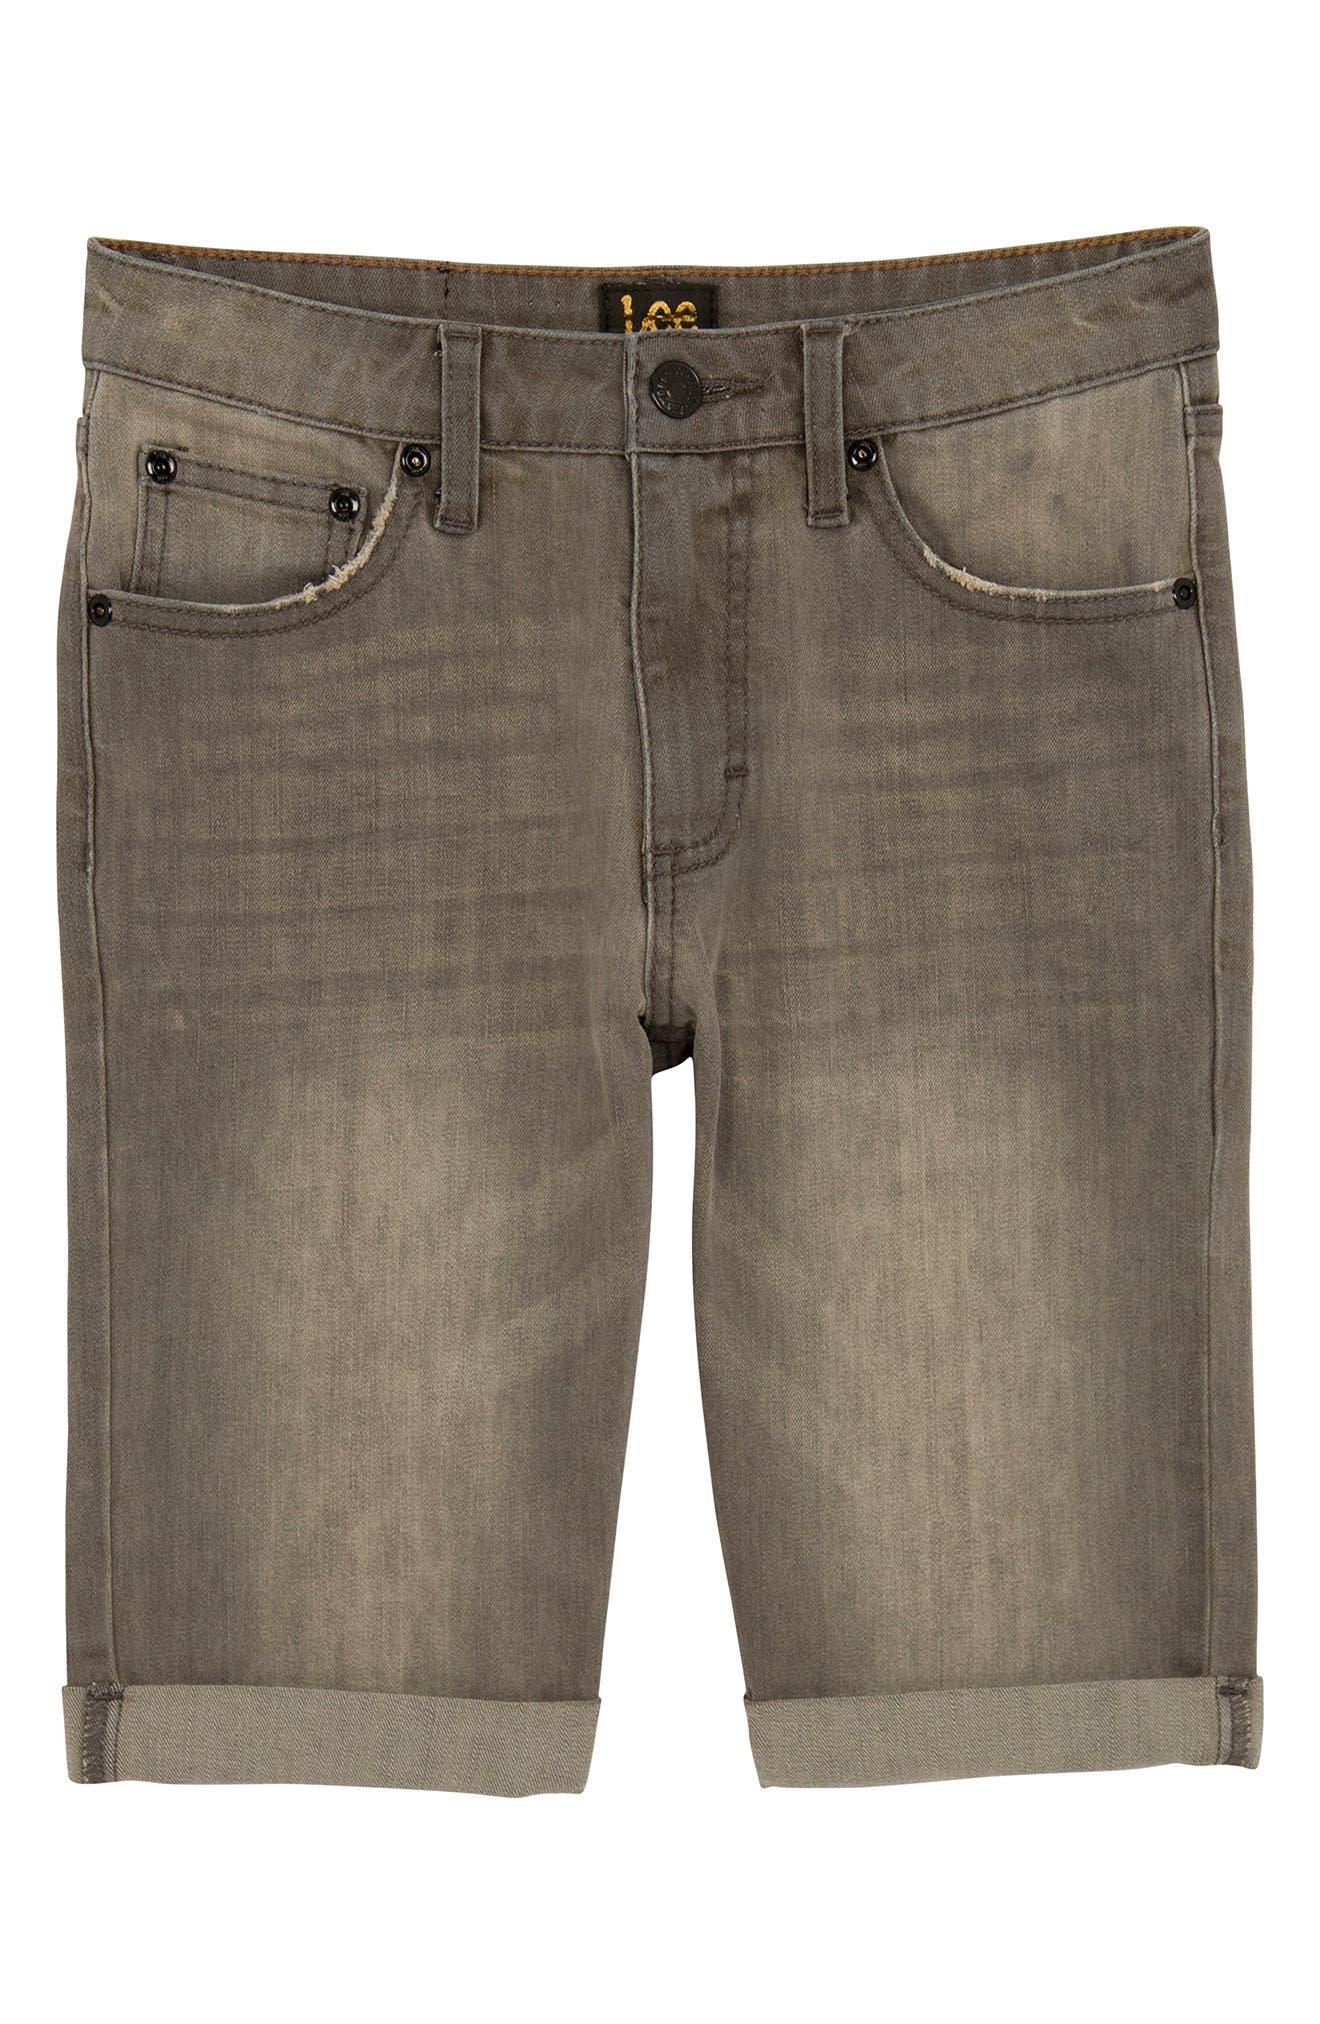 Straight Leg Cuffed Denim Shorts,                         Main,                         color, Wrecked Boat Grey